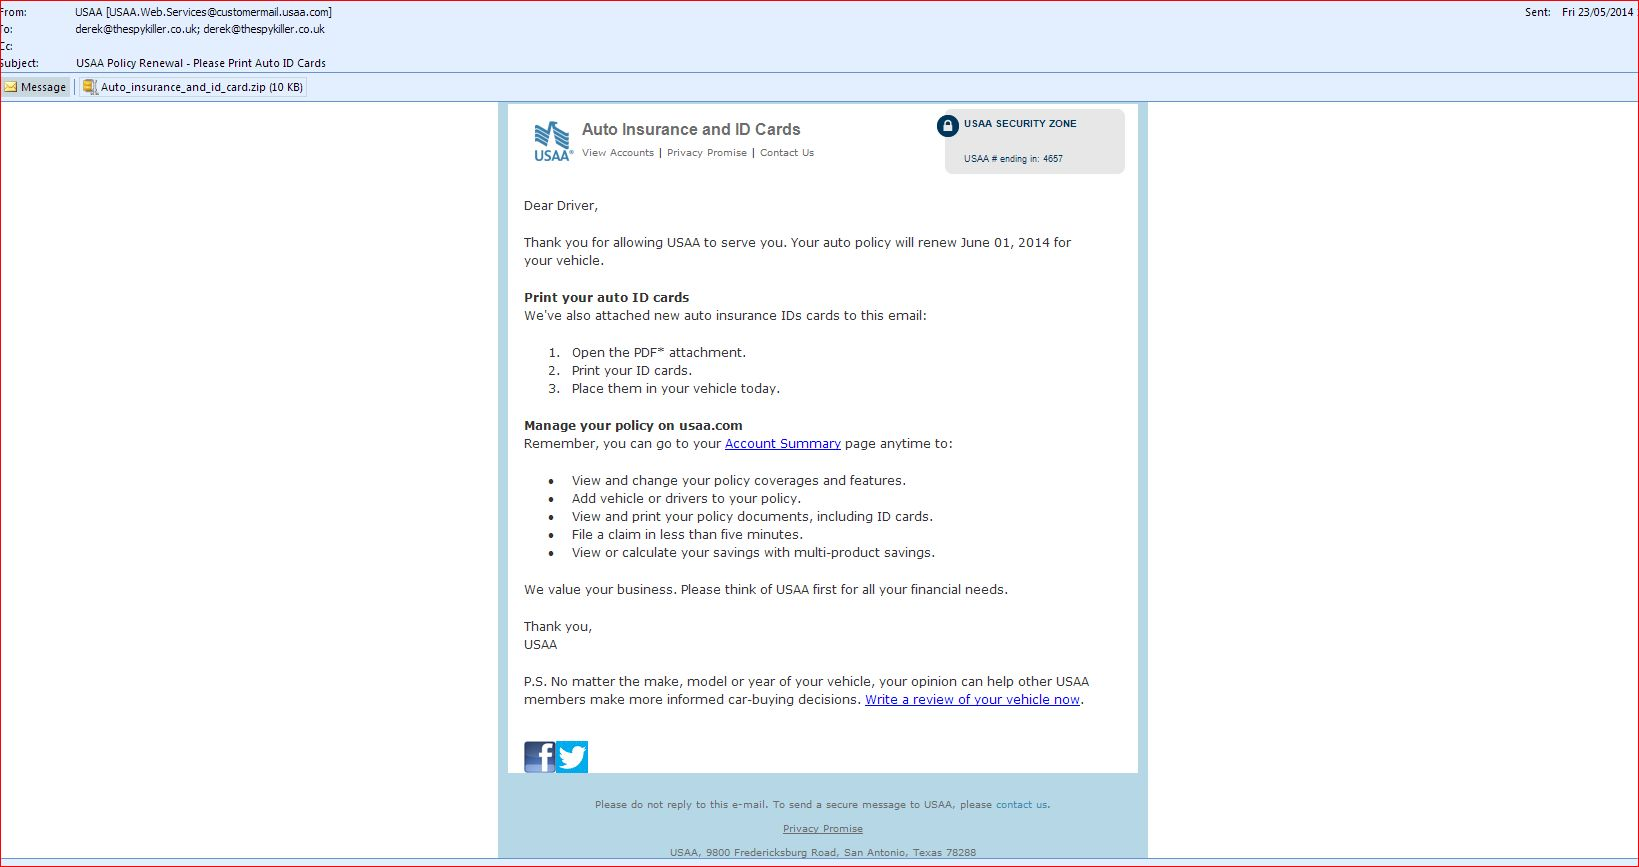 Usaa Policy Renewal Please Print Auto Id Cards Fake Pdf